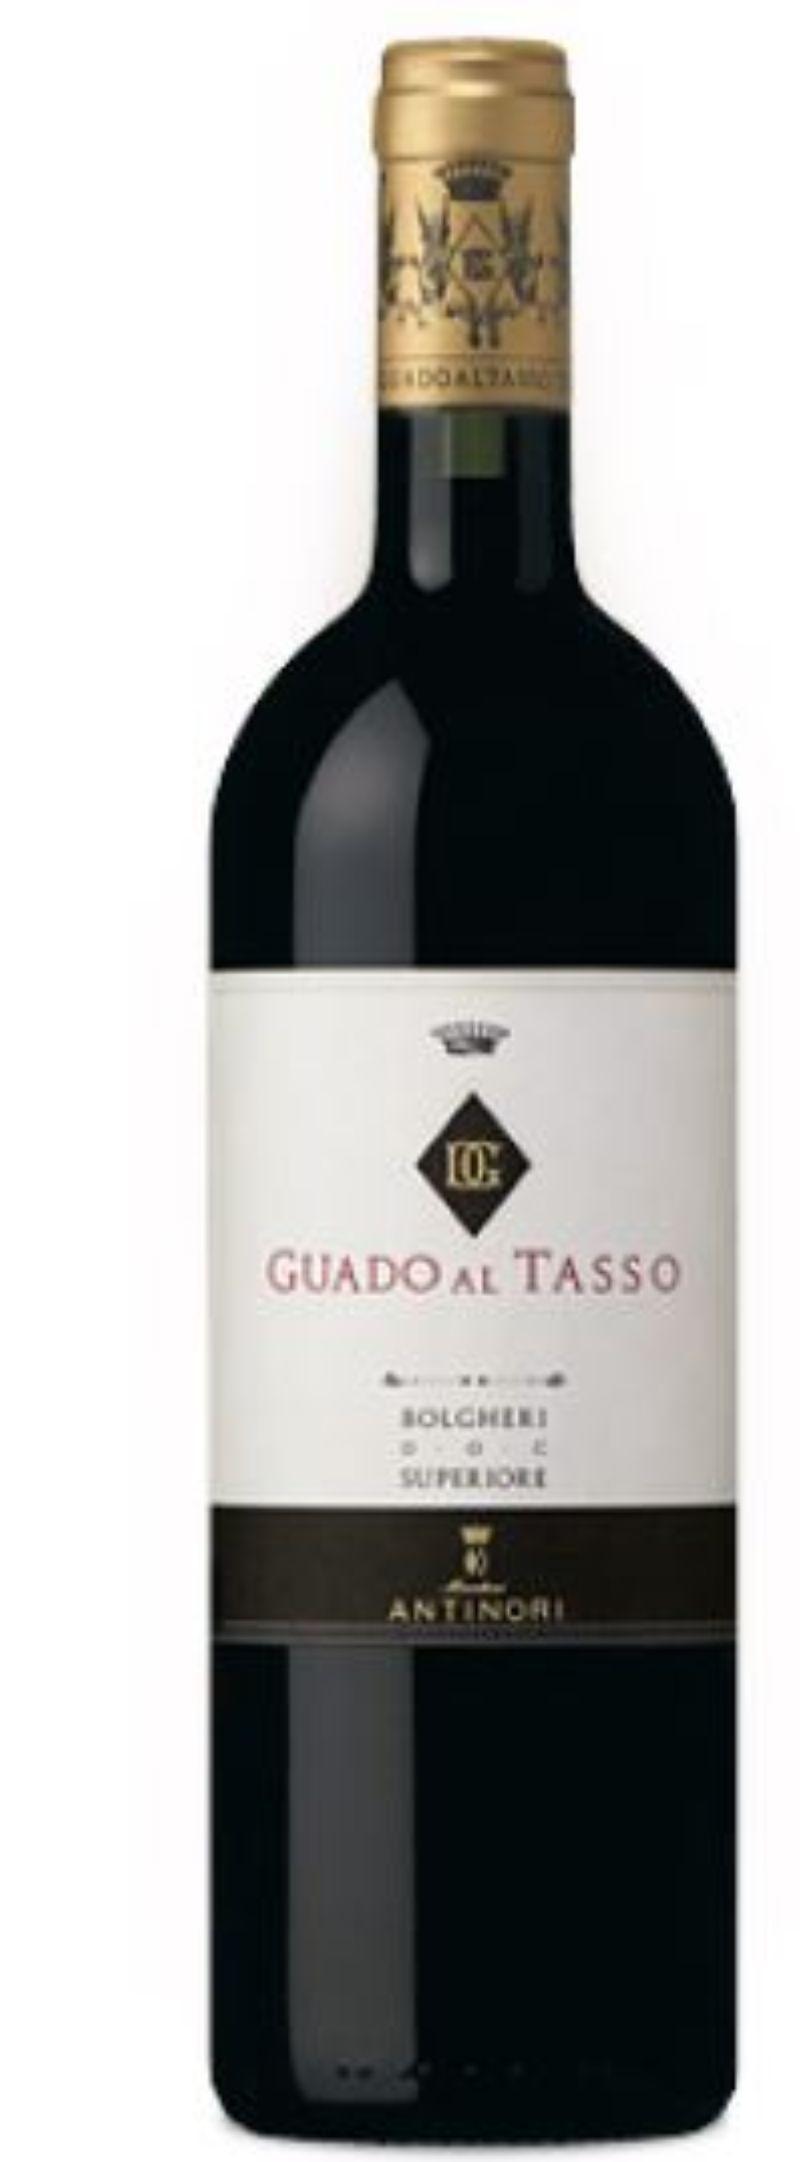 GUADO-AL-TASSO-BOLGHERI-SUPERIORE-DOC-ANTINORI-1996